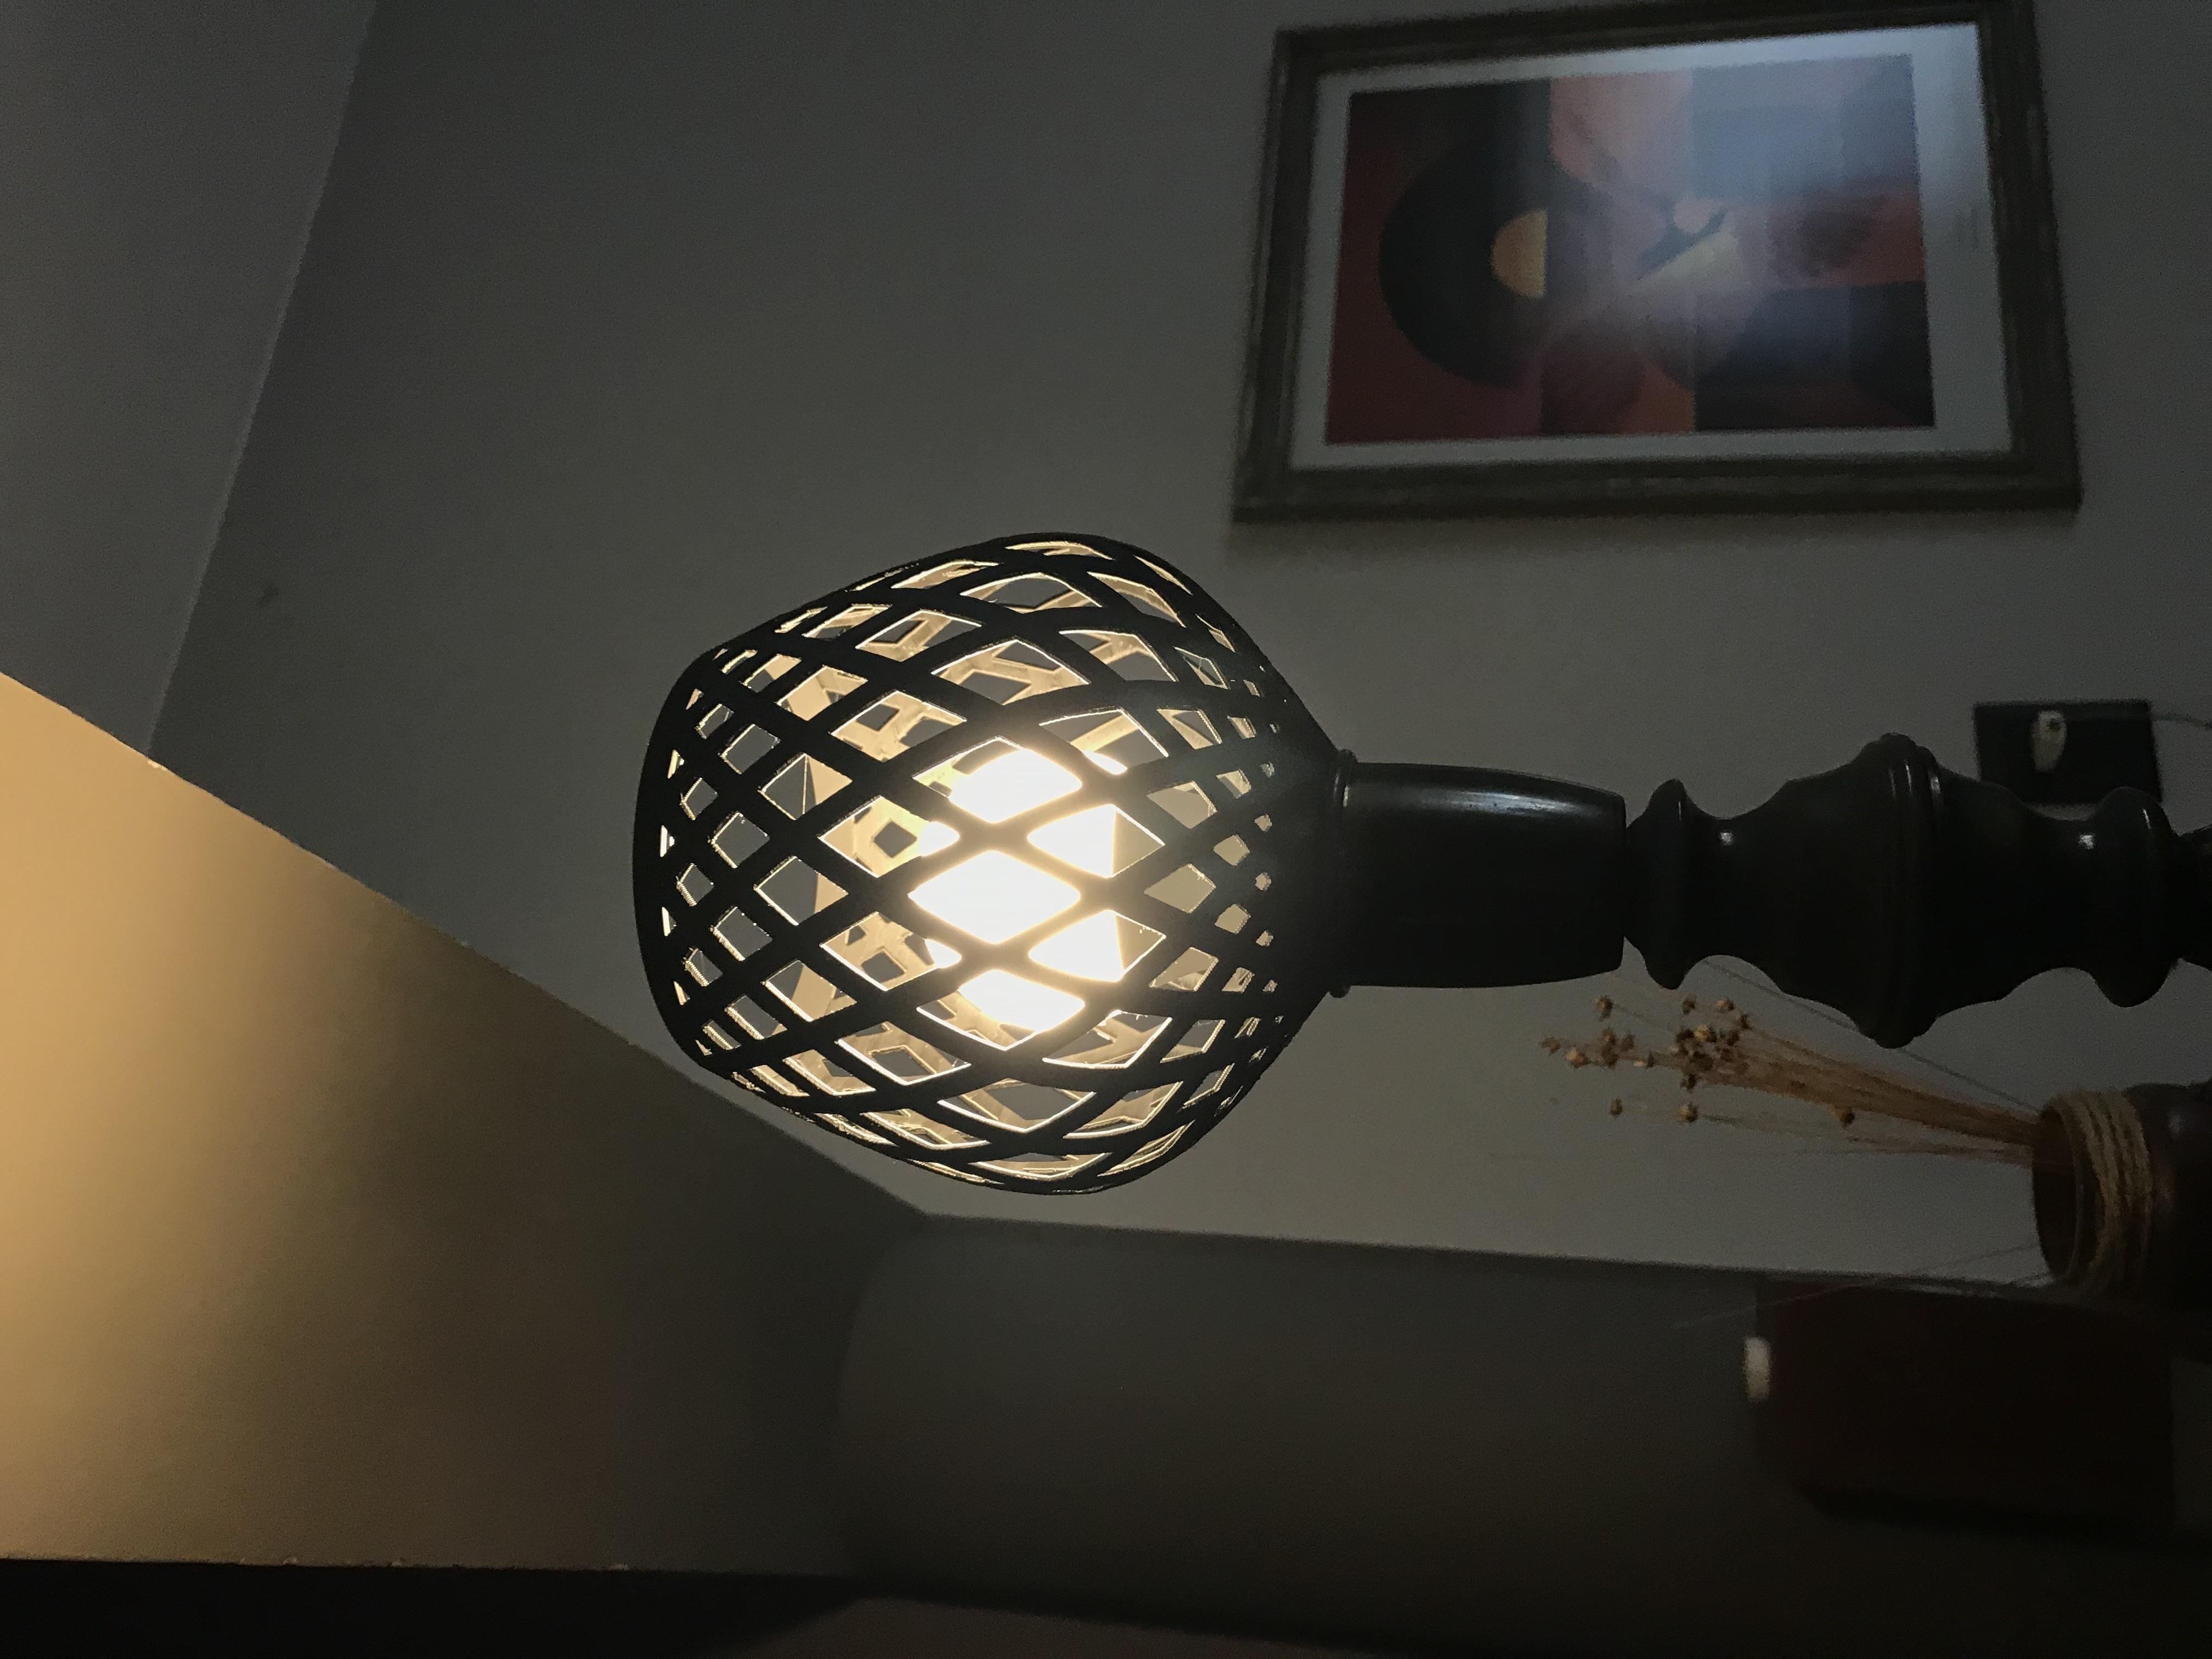 IMG-5664.jpg Download free STL file Geometrical lamp • 3D print template, sjgutierrez9